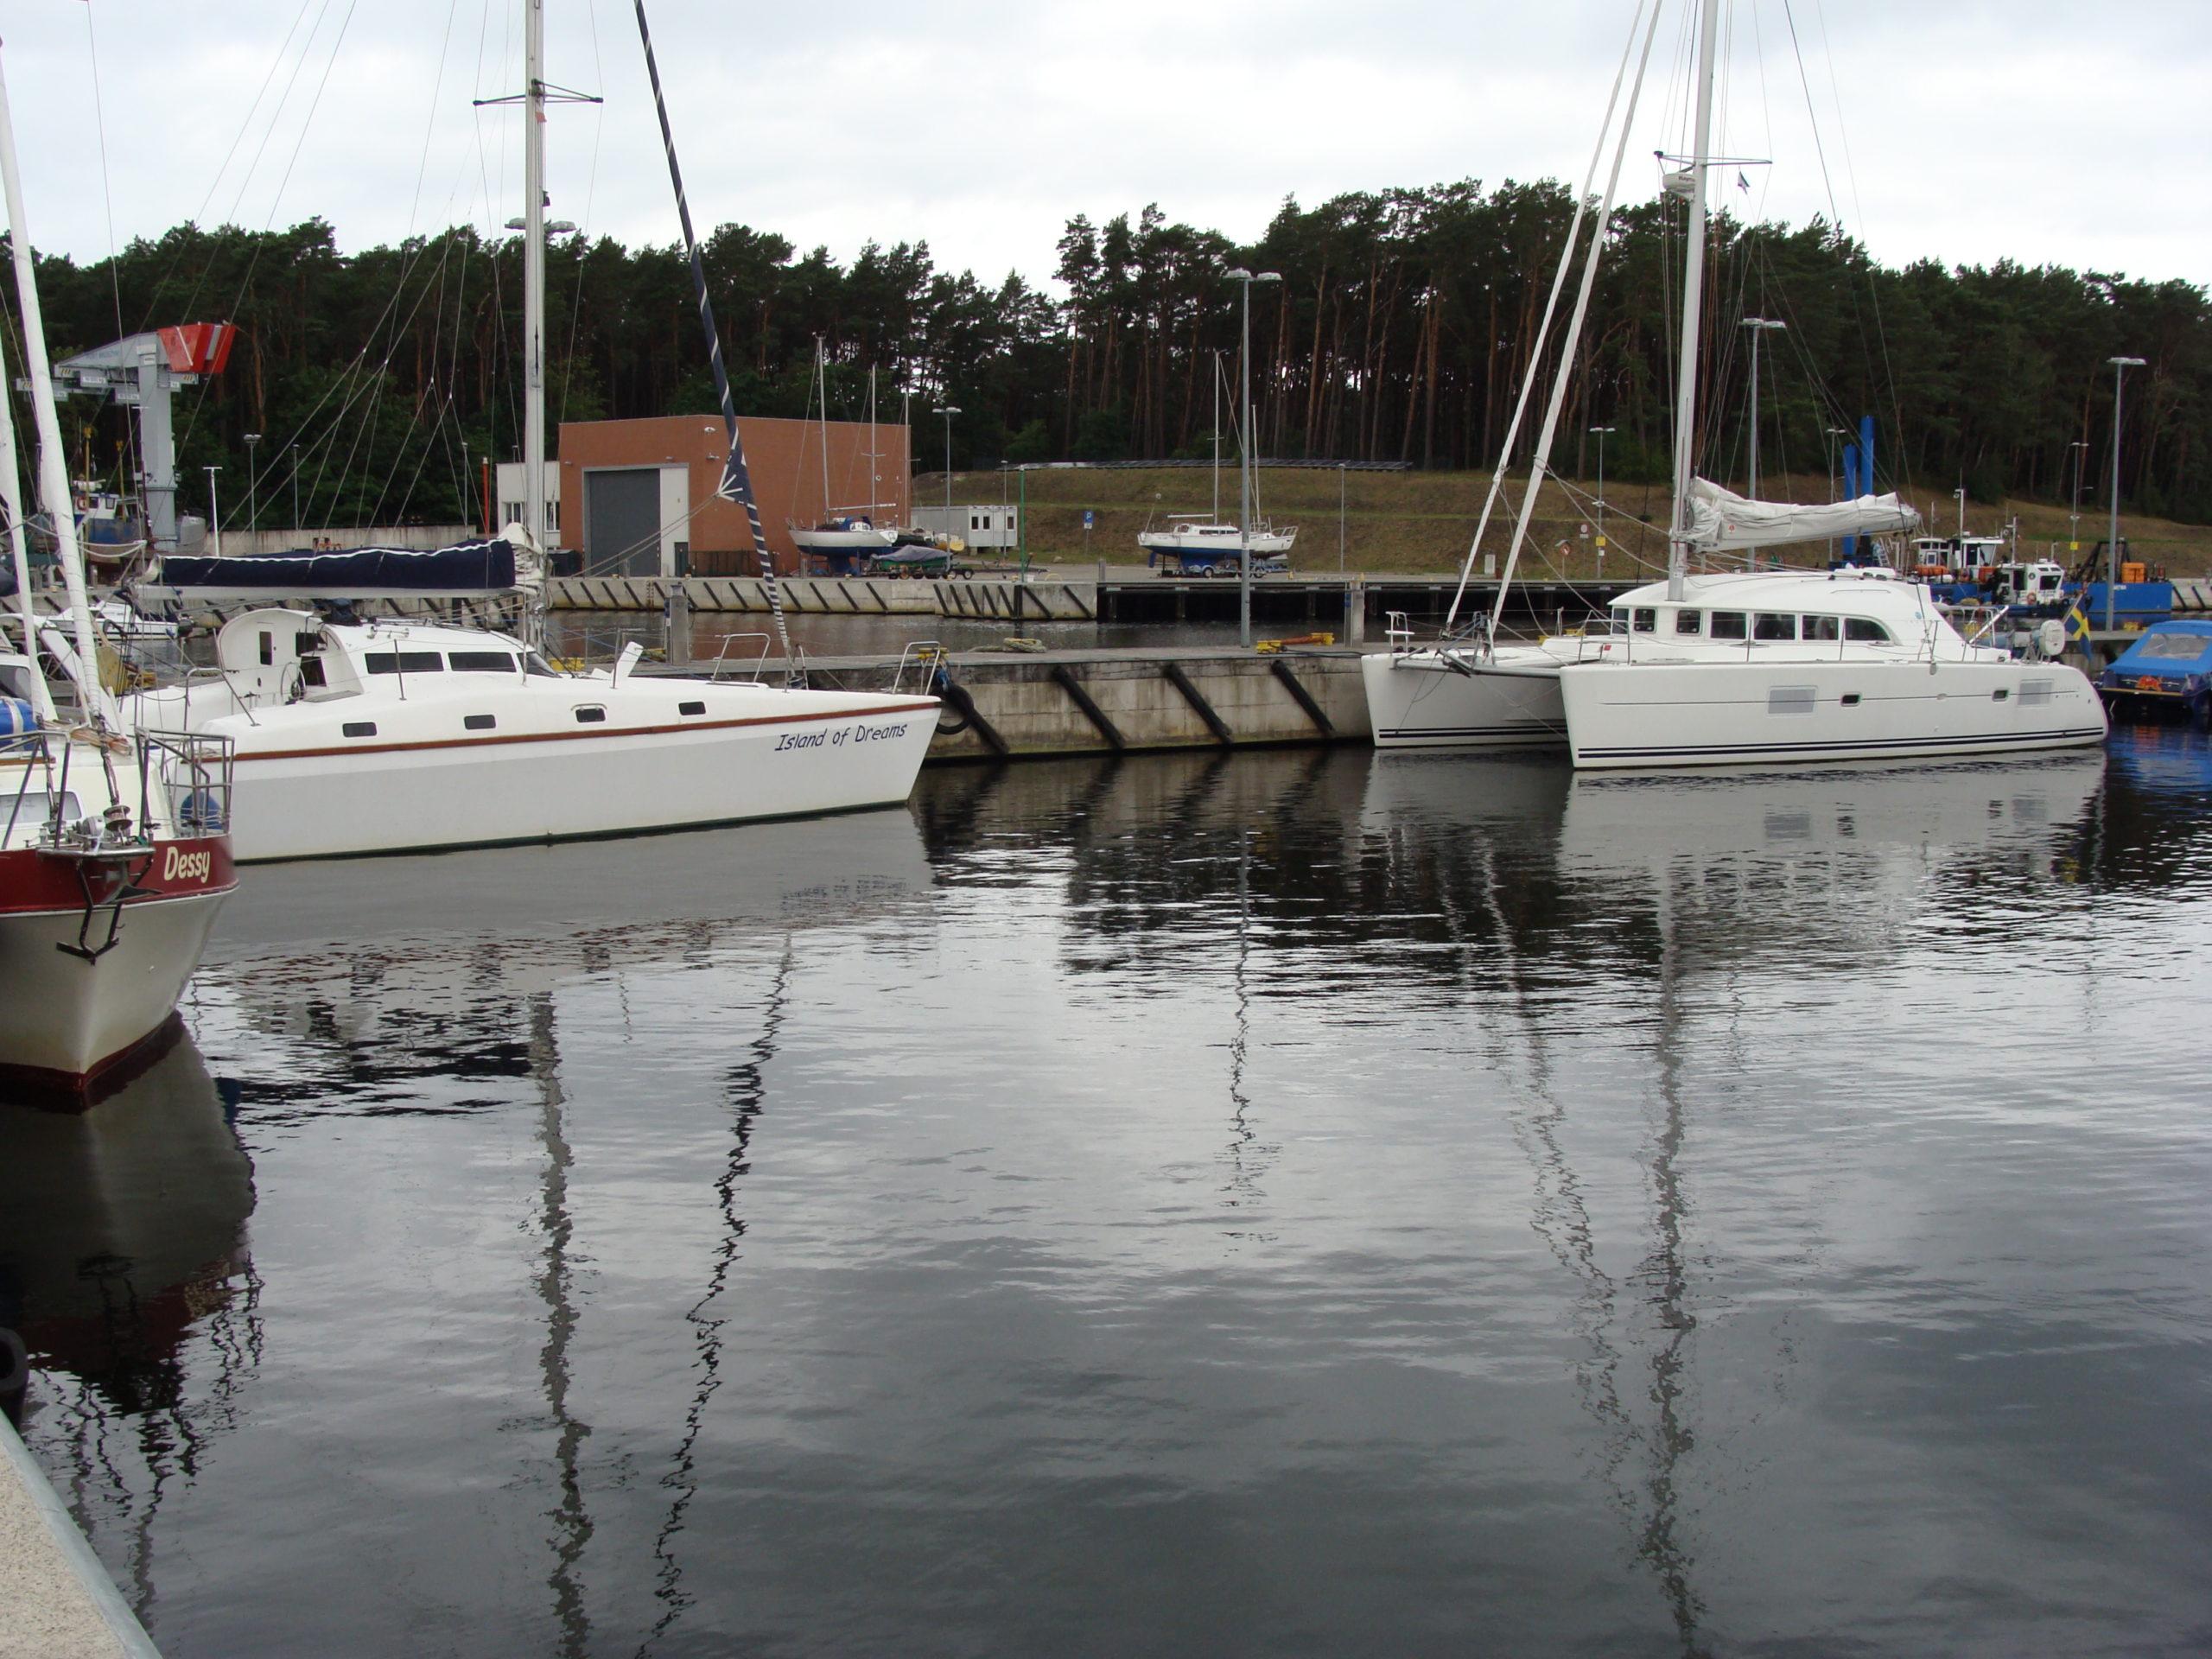 Jacht morski 21